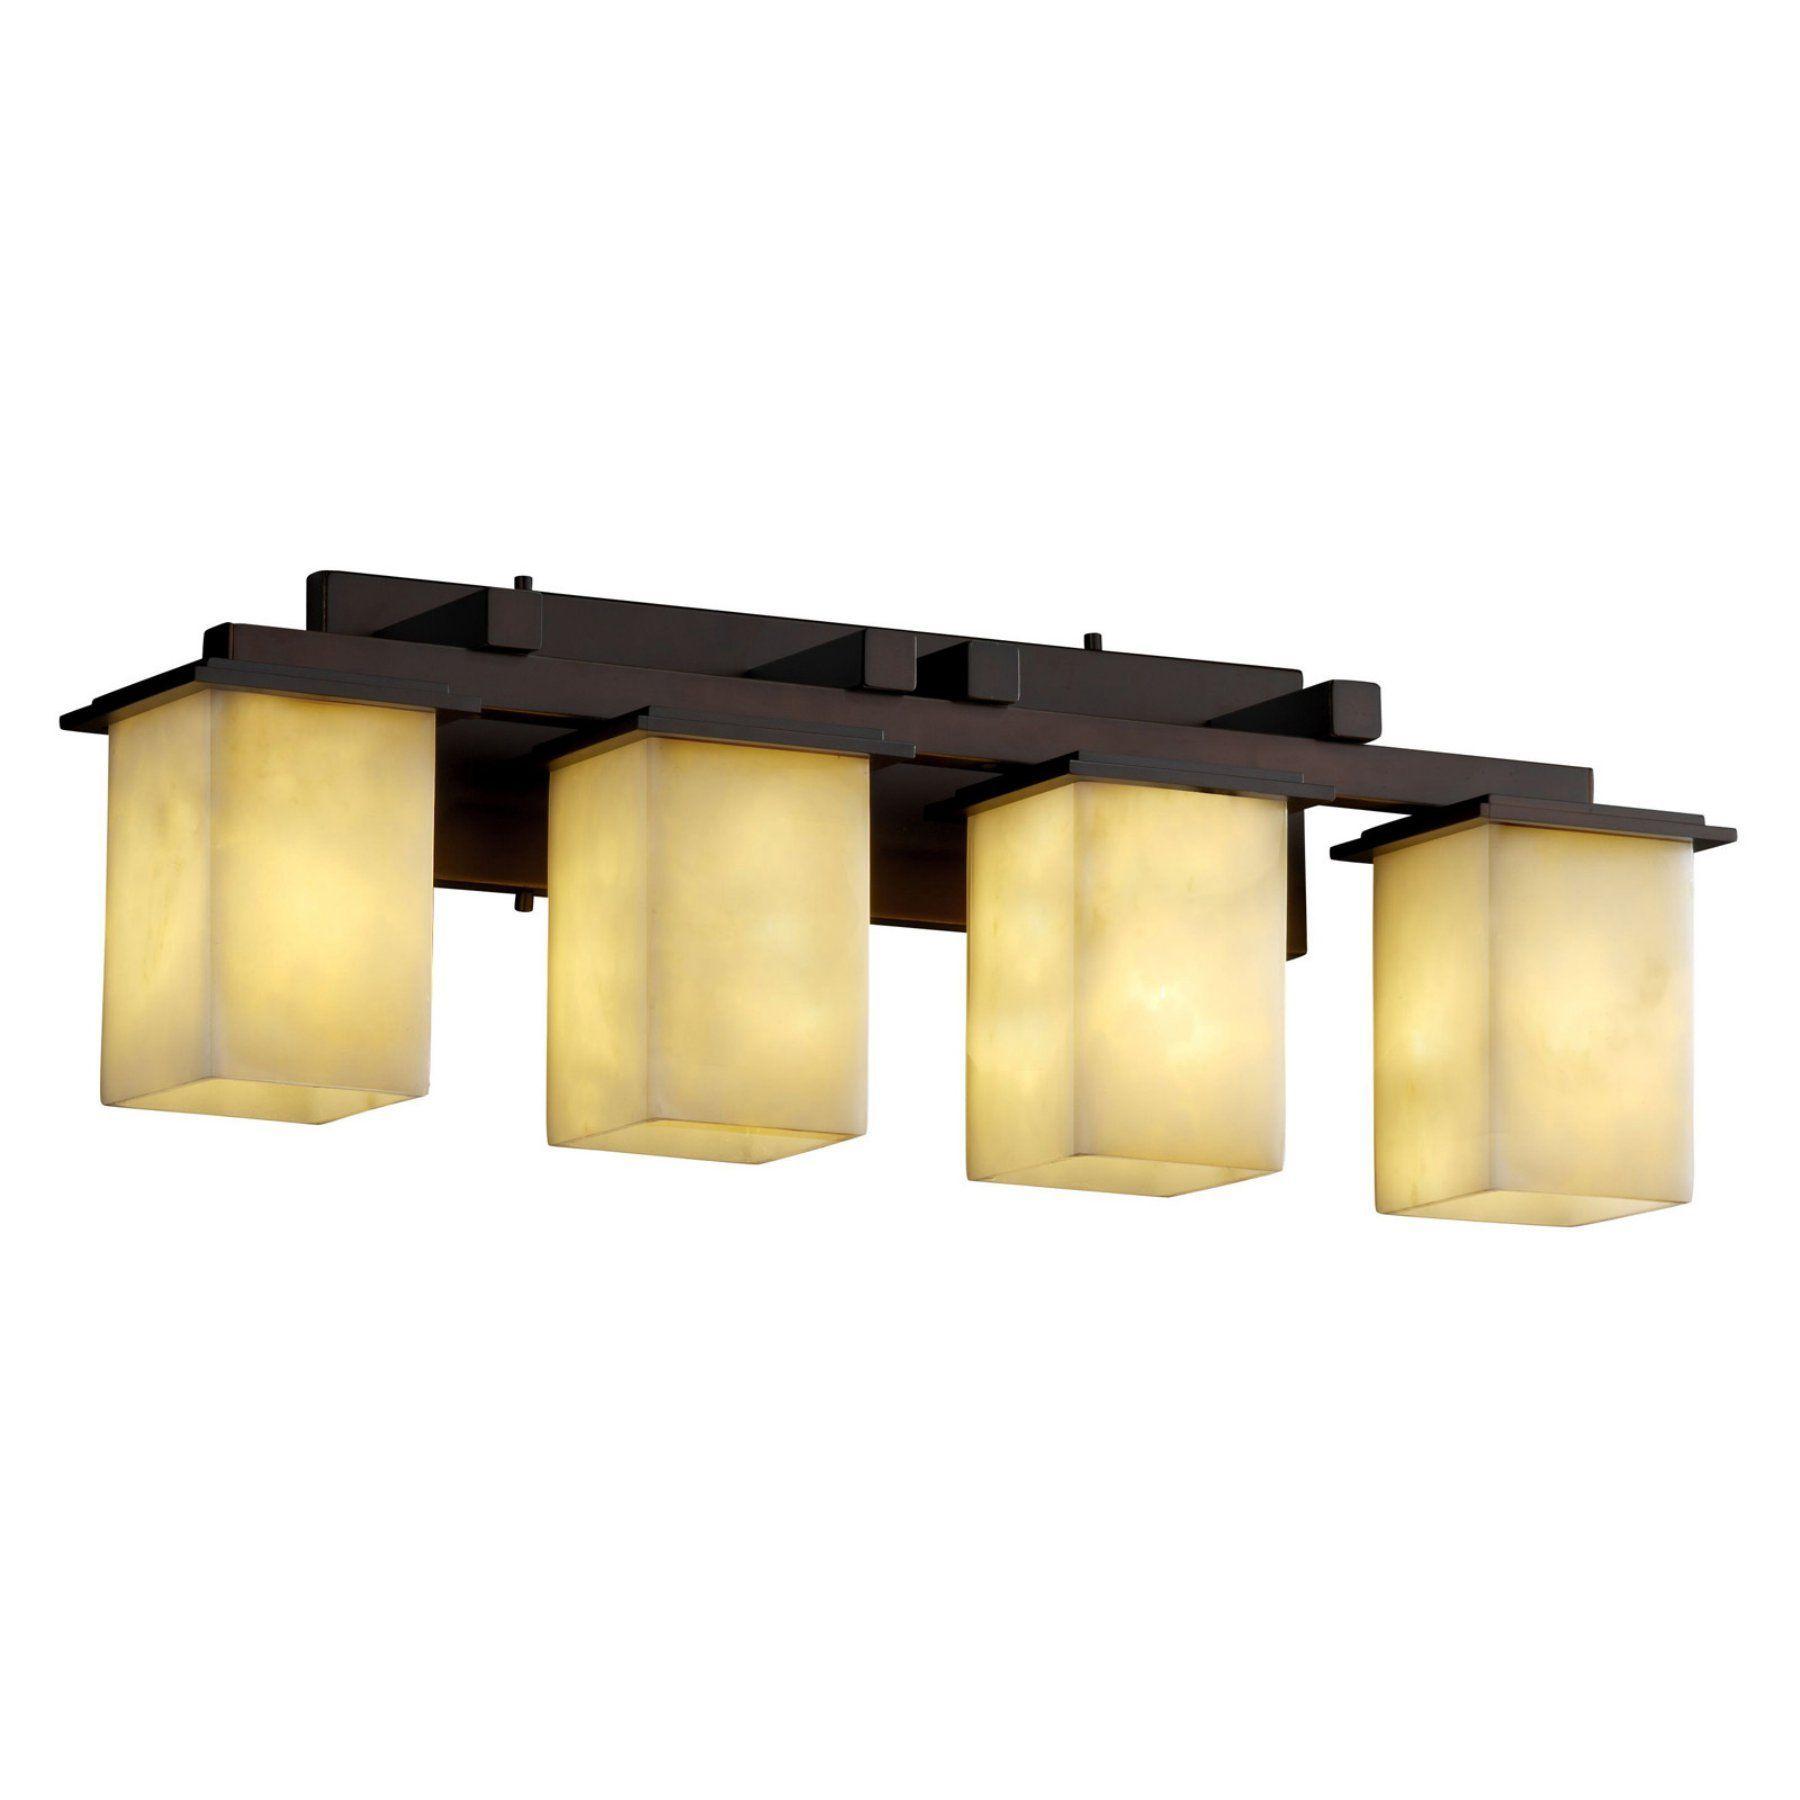 Justice Design Group Cld 8674 Montana 4 Light Bath Bar